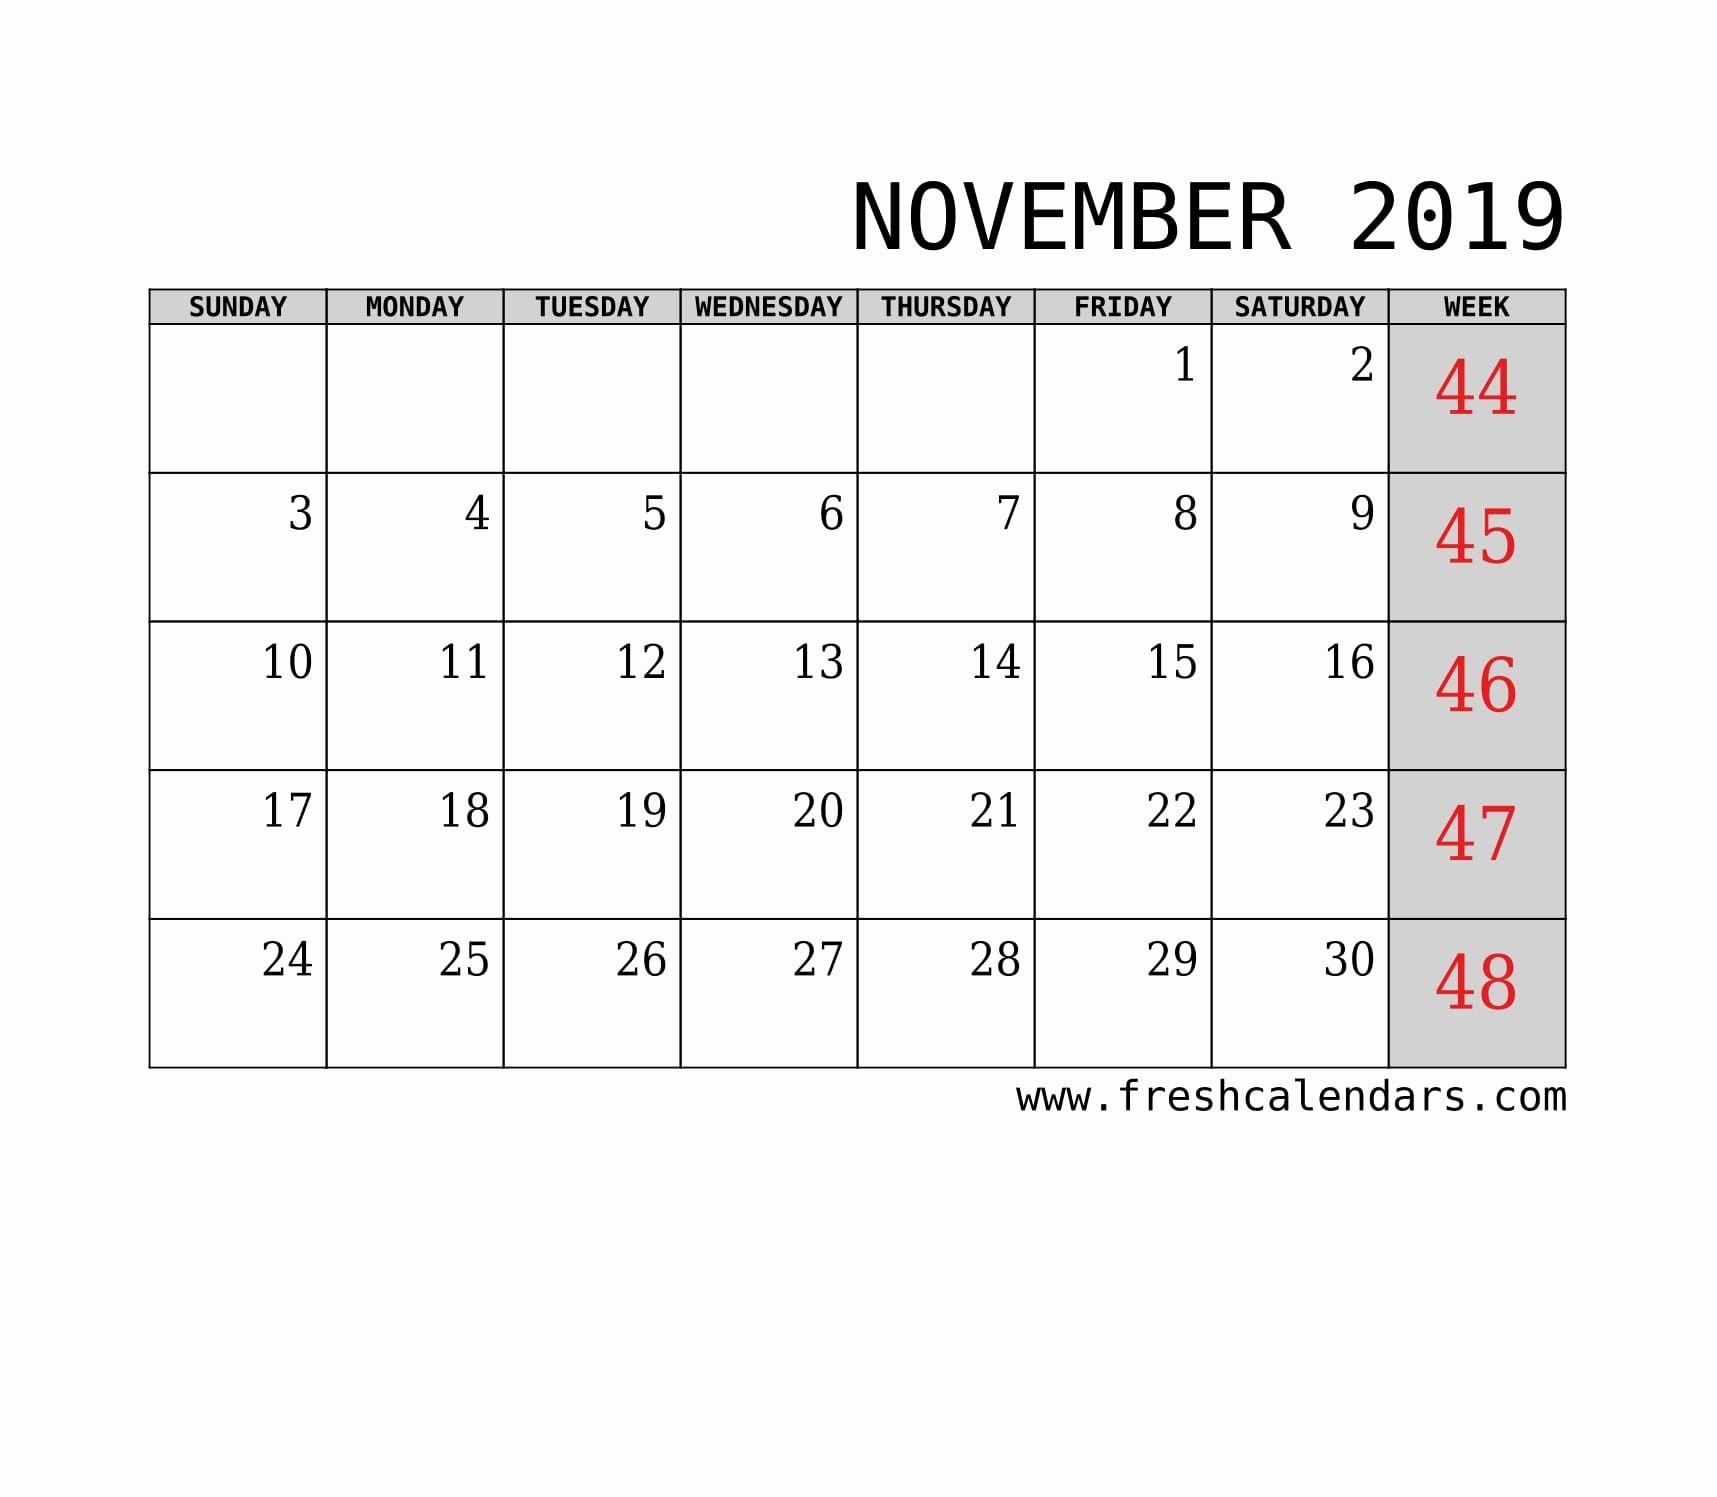 5 Day Calendar Template Vaydile Euforic Co Blank Calendar Template 5 Day Weekly Calendar Template Free Weekly Calendar Weekly Calendar Planner